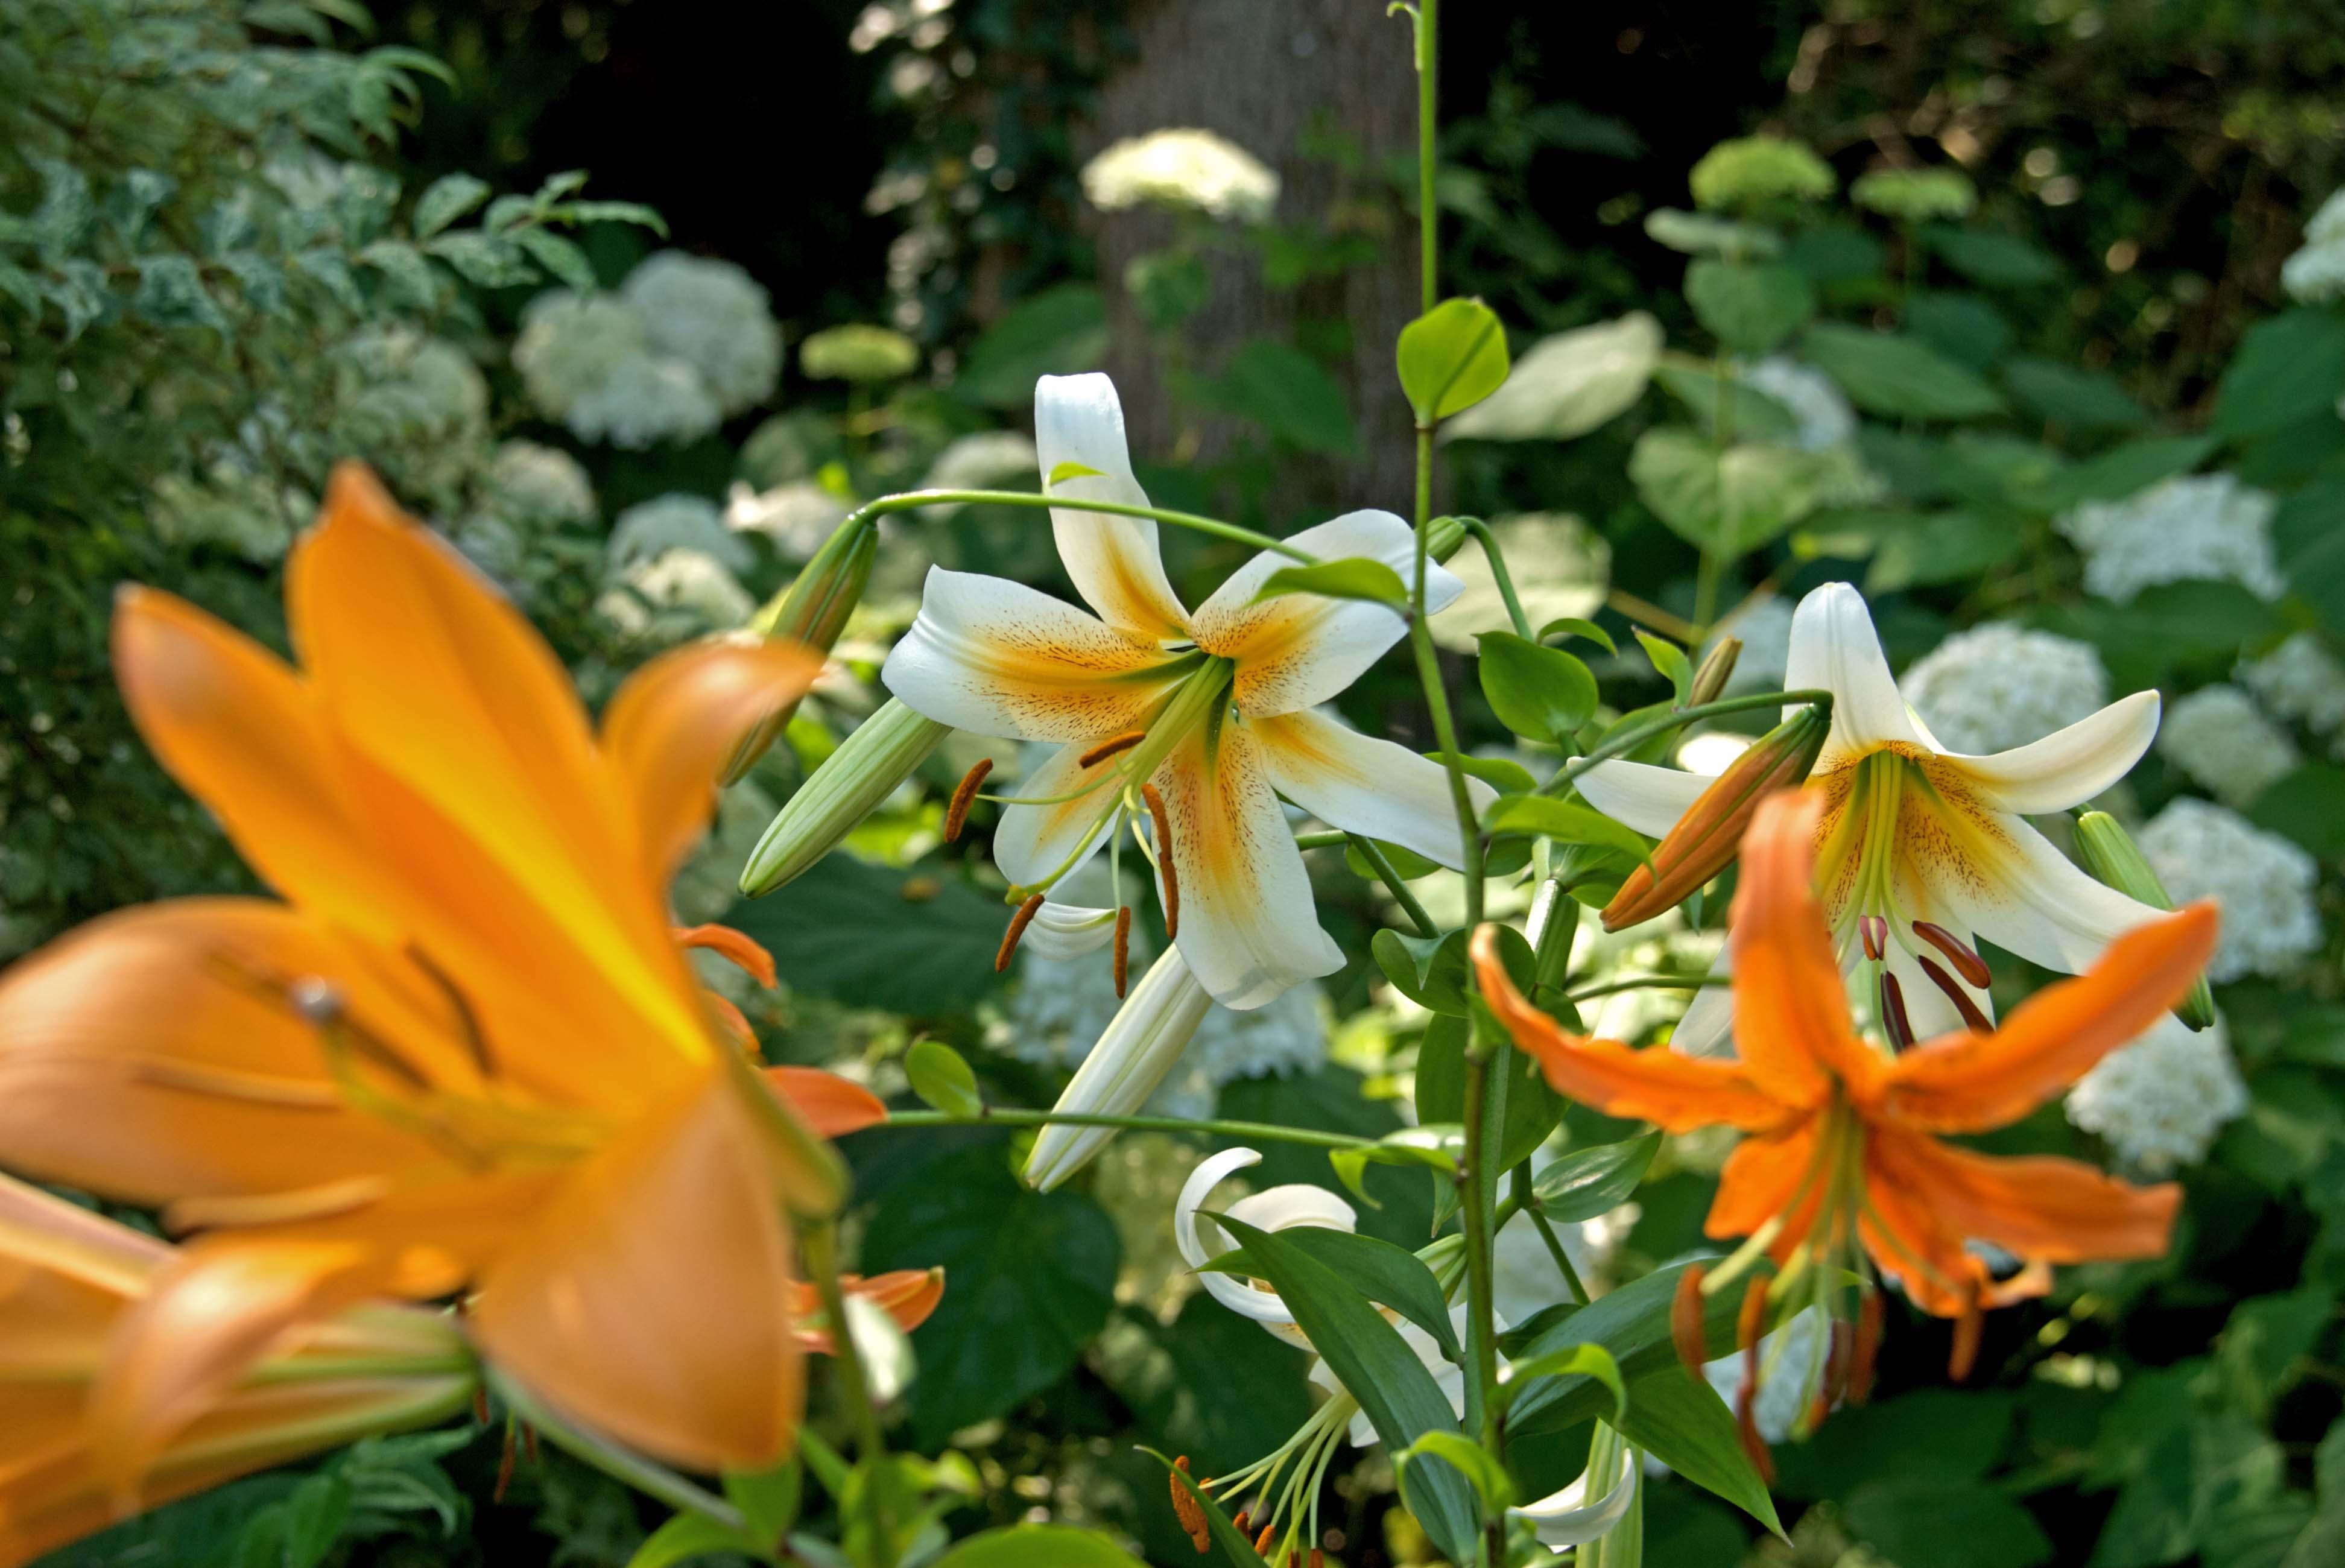 Lilies_7-5-10_hori